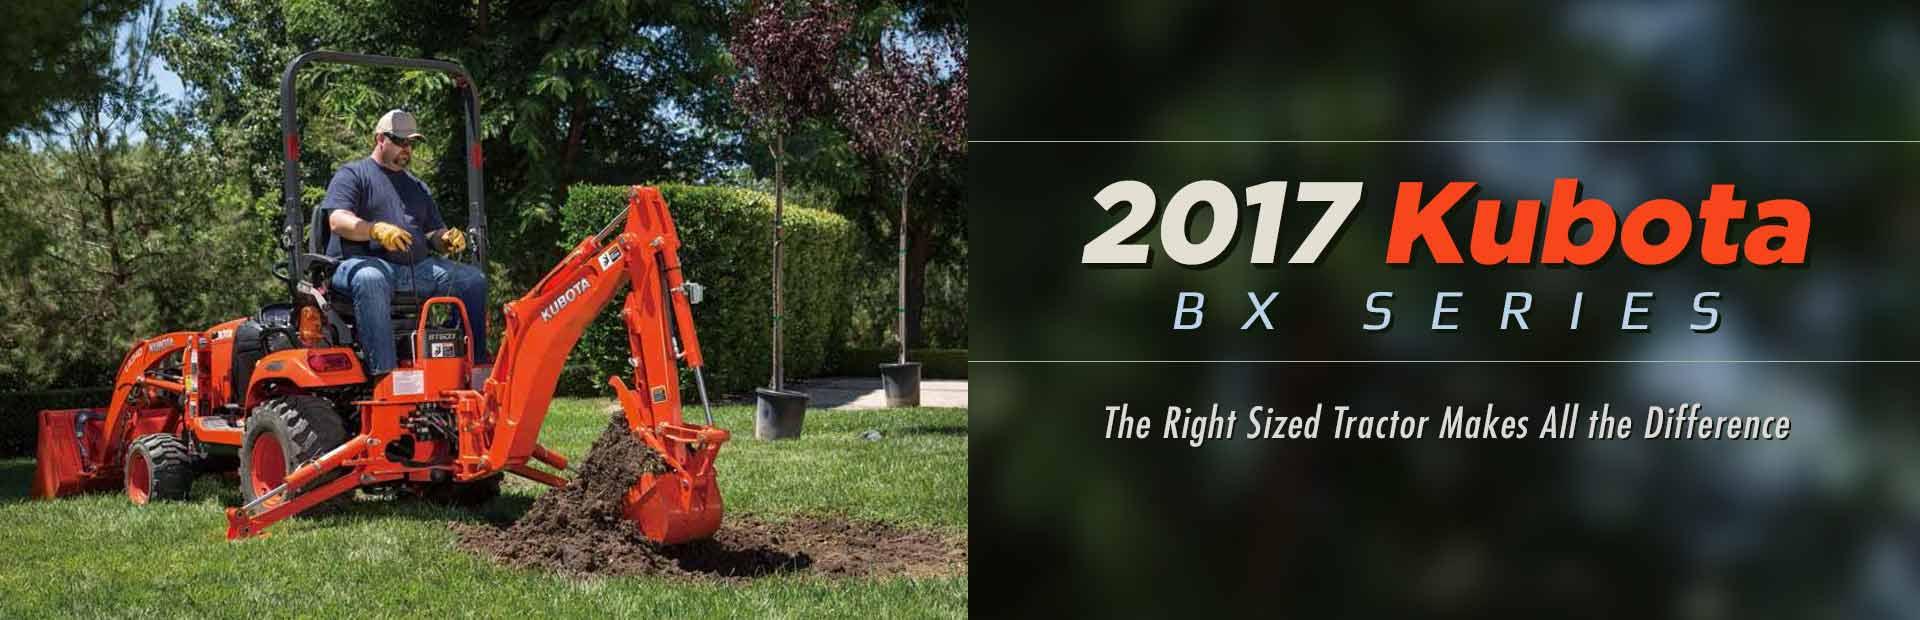 2017 Kubota BX Series Click here to view the models. & Watkins Tractor u0026 Supply | Sunset Equipment